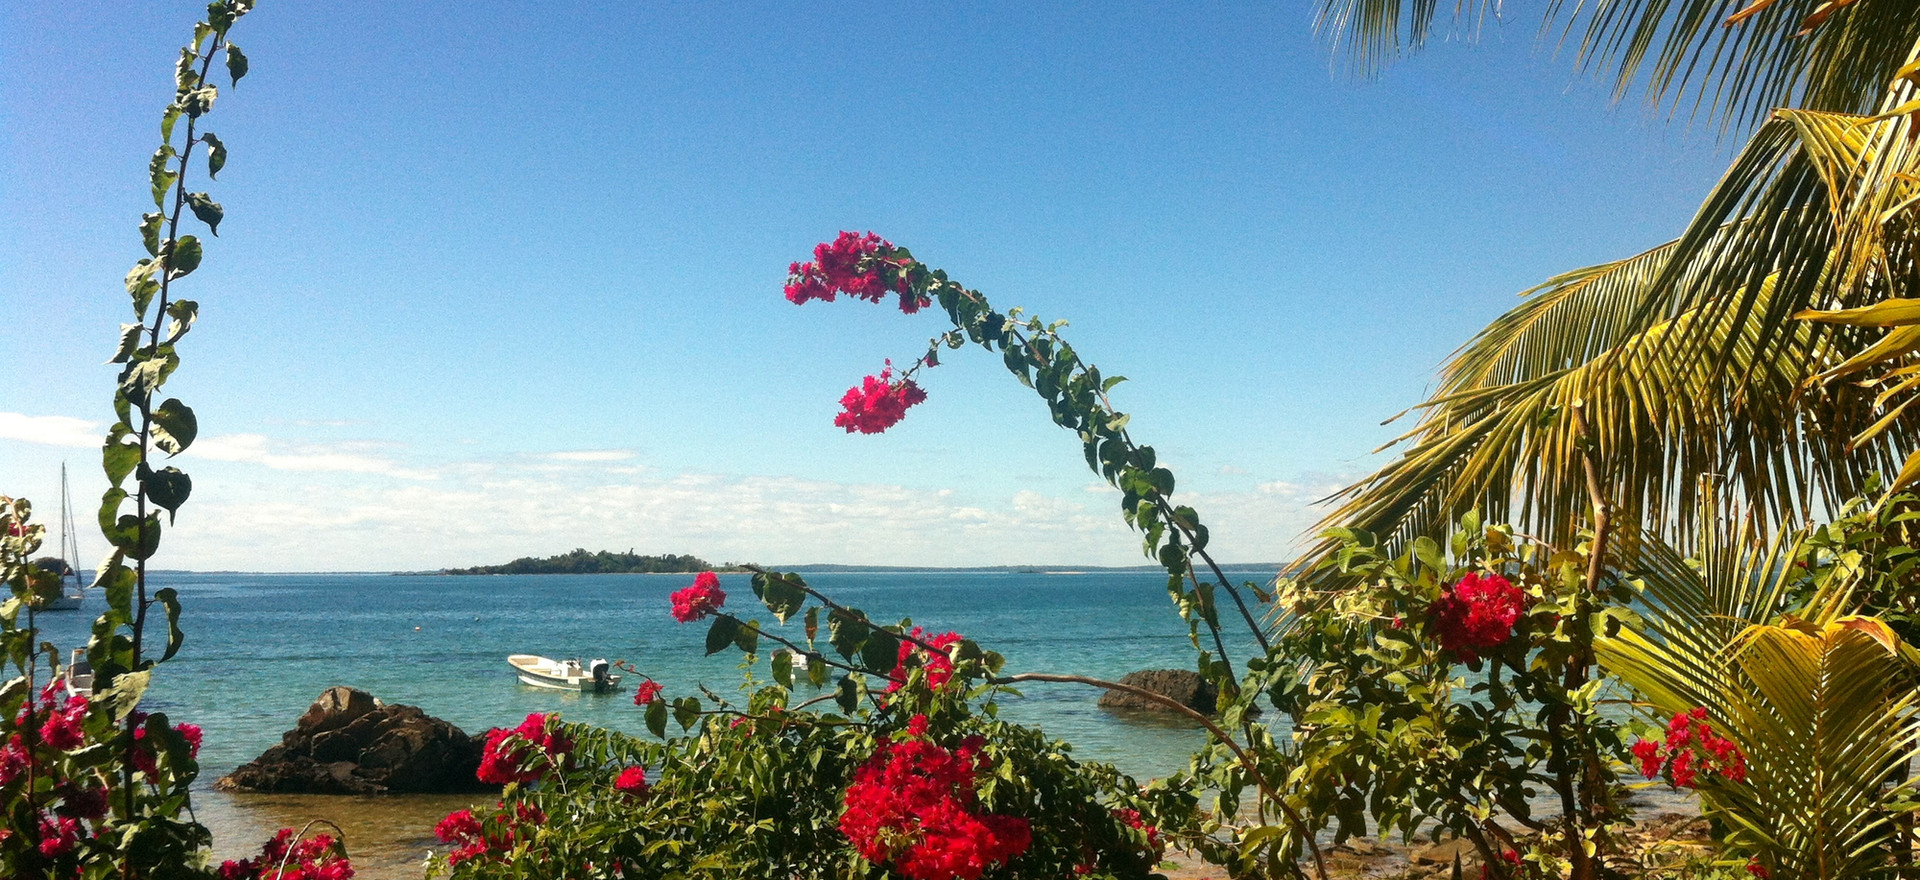 Balade en montagne - Floraly Komba